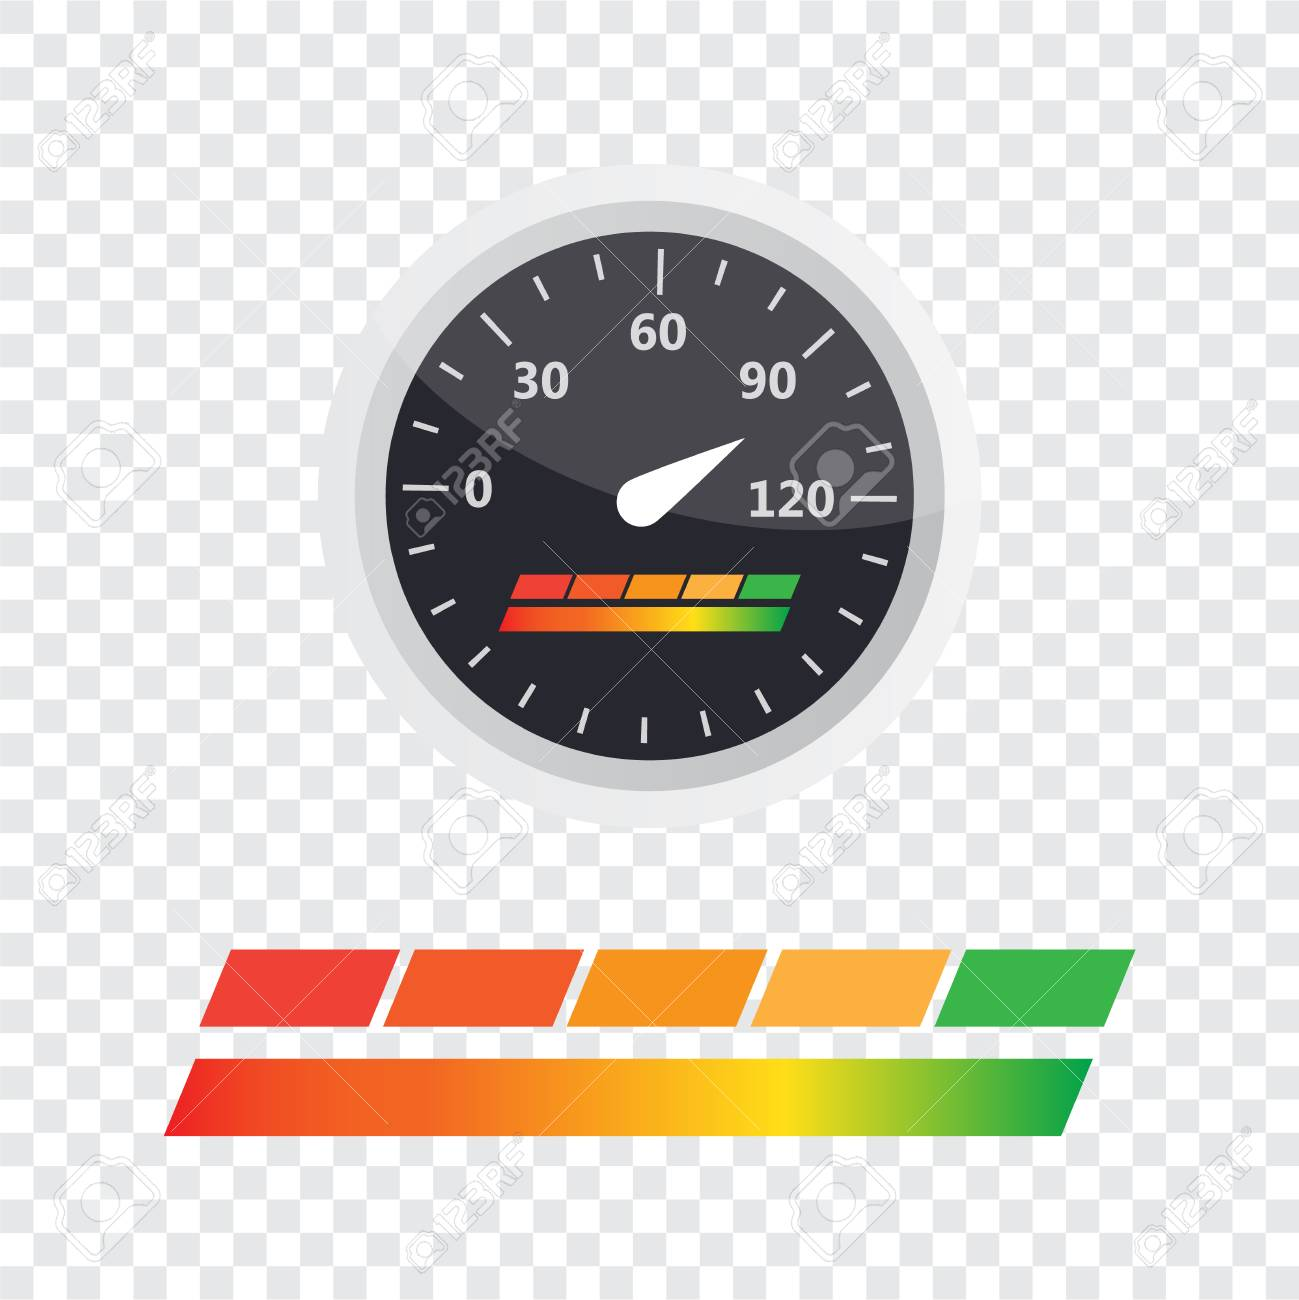 guage icon credit score indicators and gauges vector set score